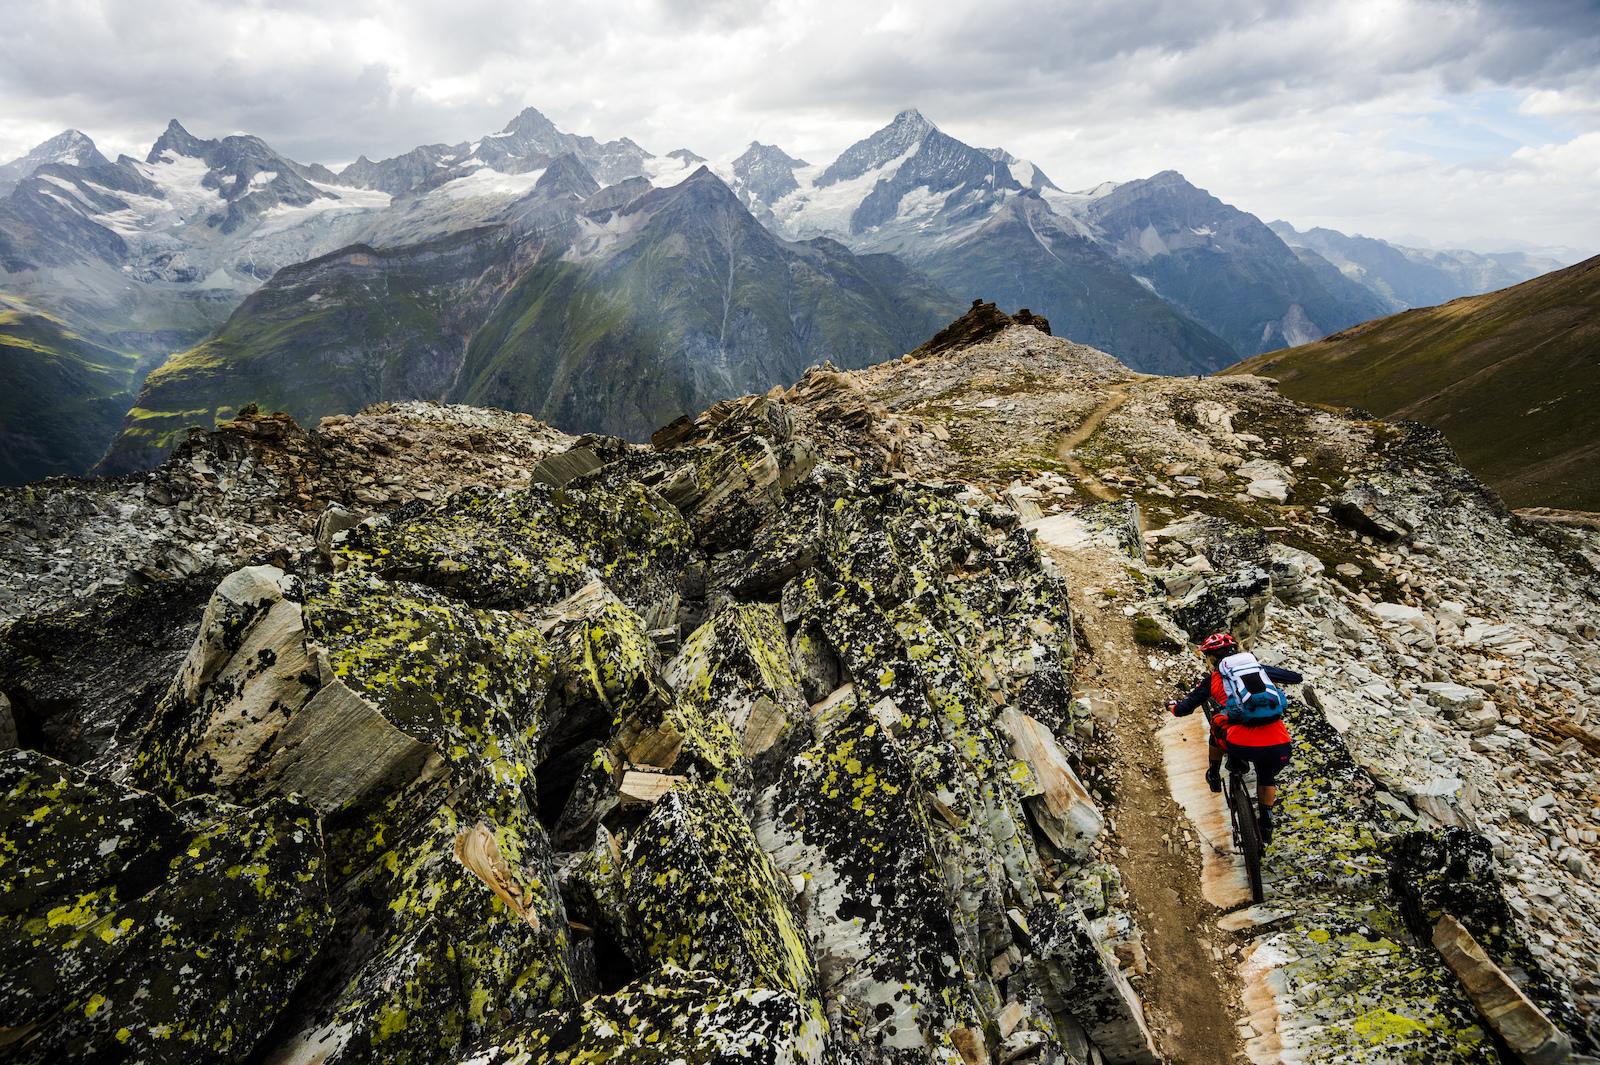 Julia Hofmann riding in Zermatt Switzerland. Photo Mattias Fredriksson.